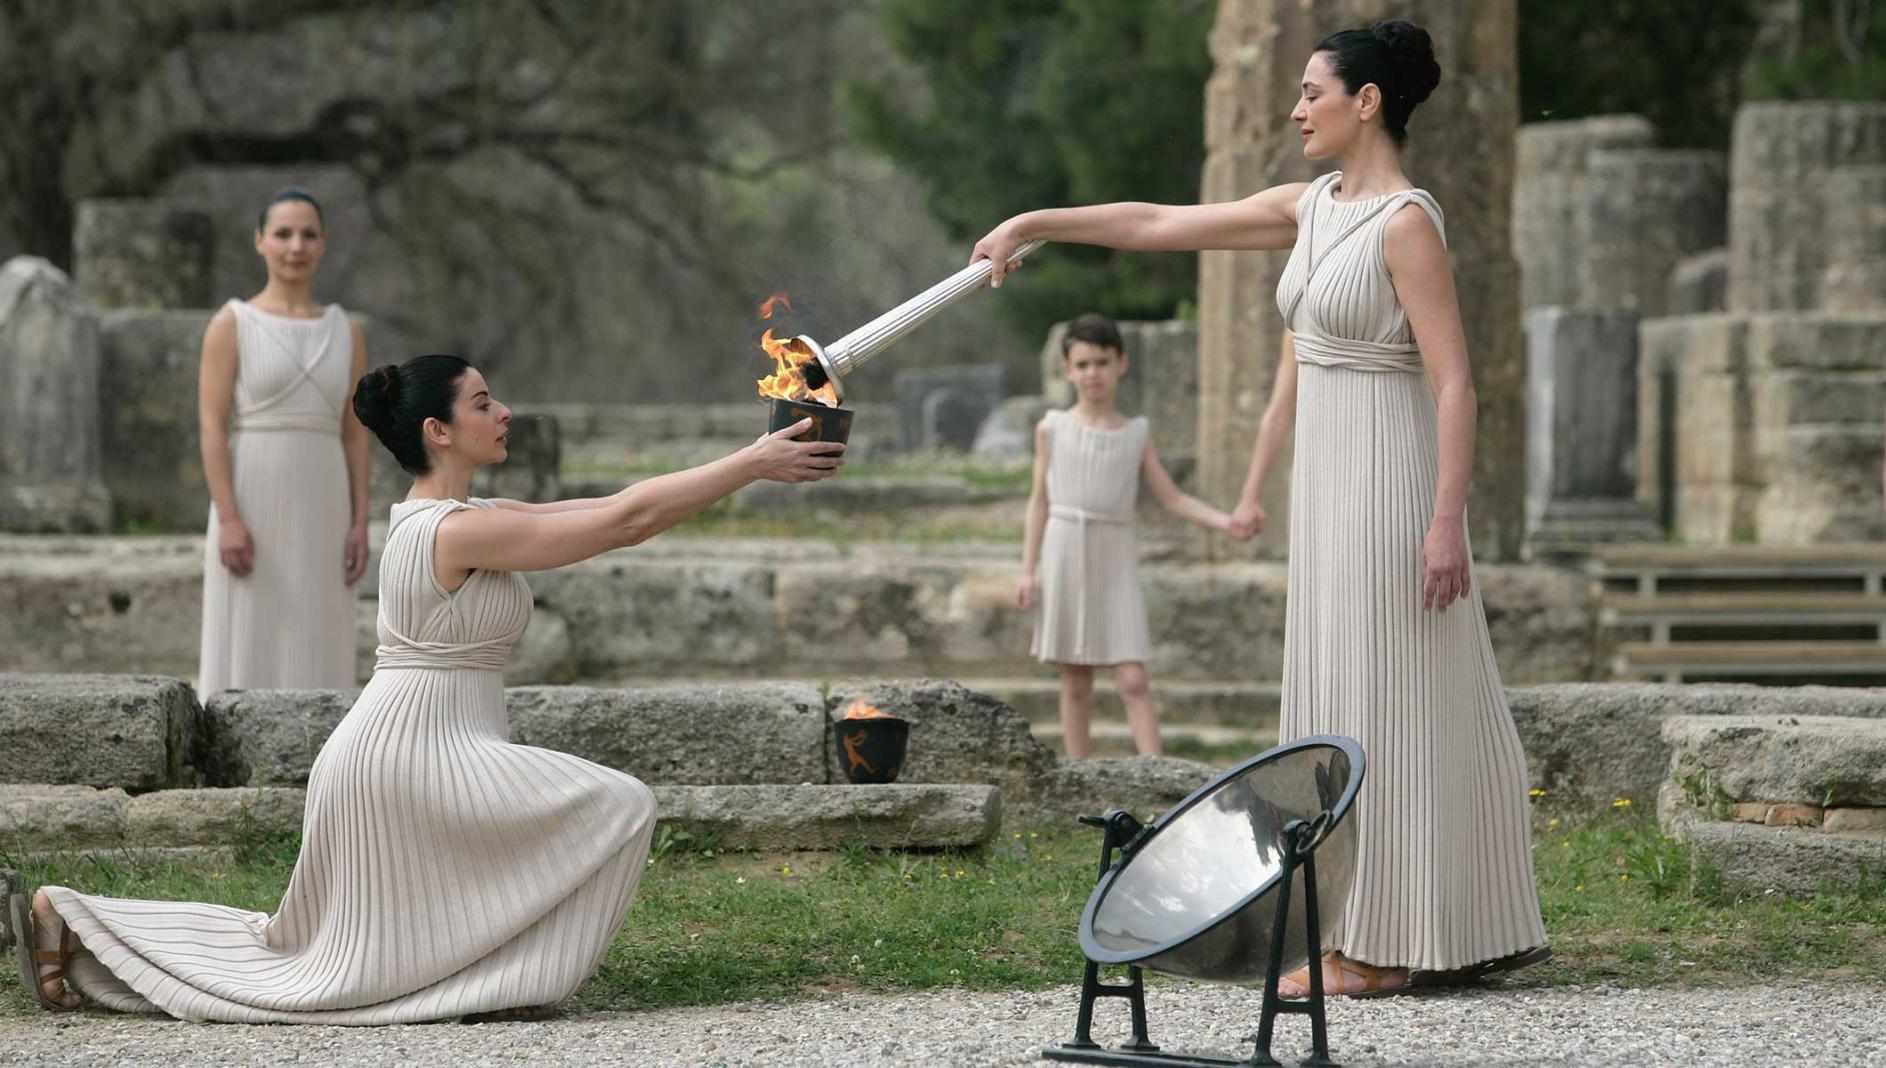 Percy Jackson Tour of Olympia - Greek Mythology Day Trip